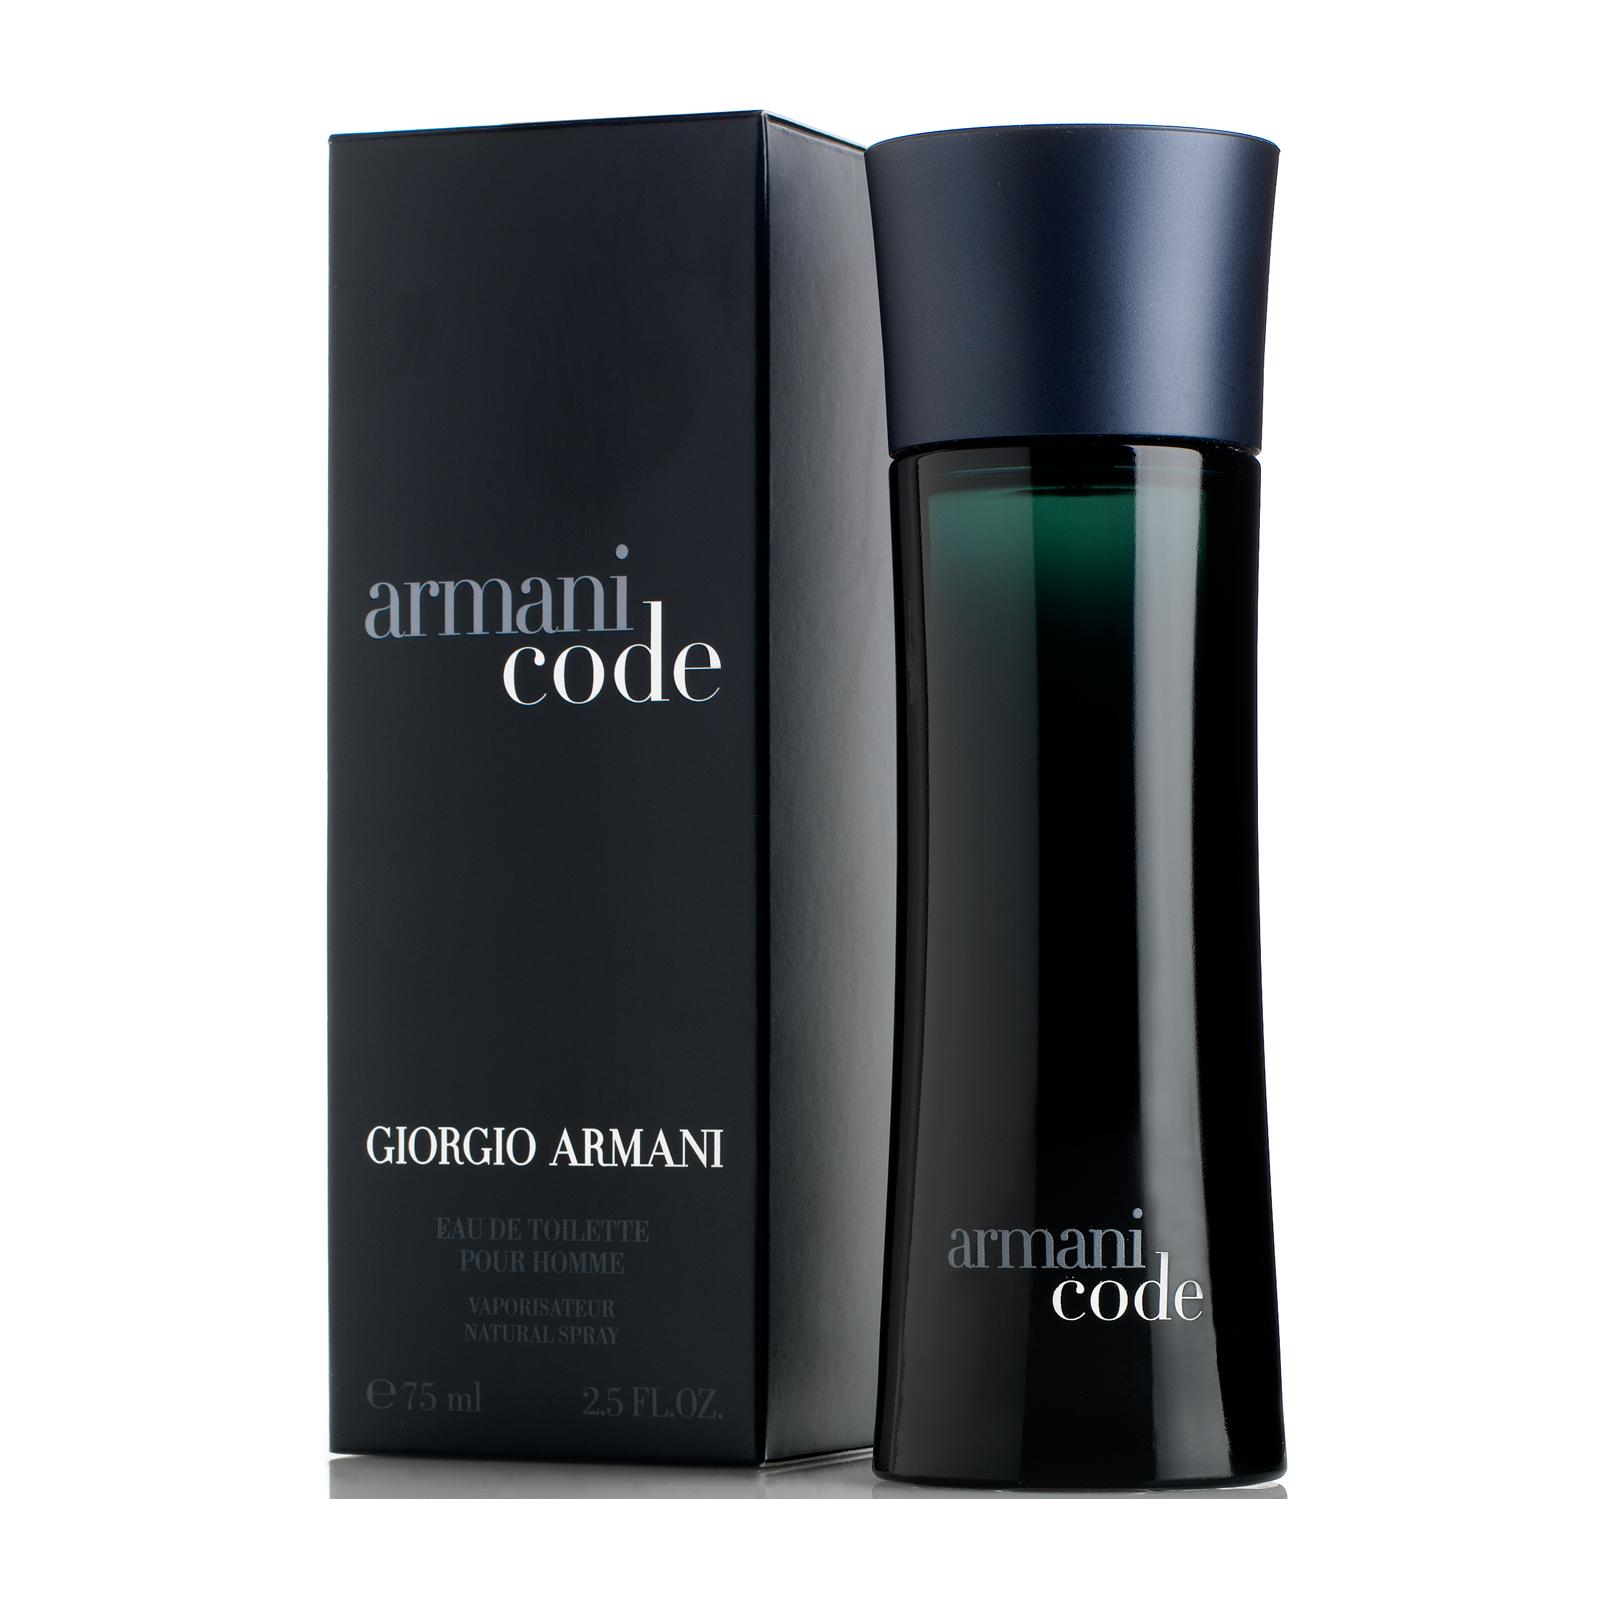 a45fd699dd9e 35.75 | Armani Code By Giorgio Armani 2.5 OZ / 75 ML EDT For Men *NEW SEALED  IN BOX* ❤ #armani #code #giorgio #sealed #fashionista #giveaway #skin  #street ...